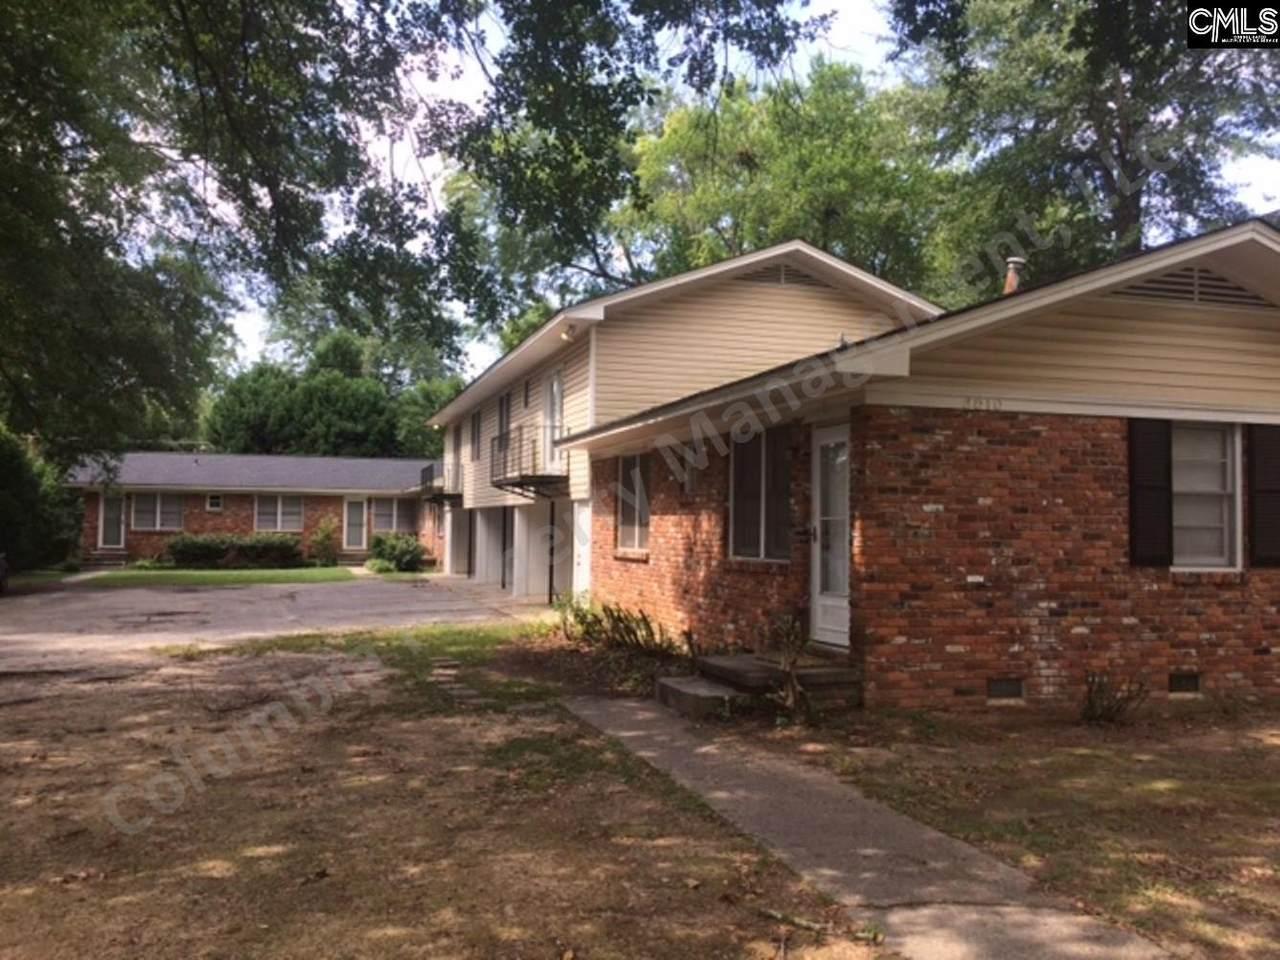 3010 Duncan Street 6 - Photo 1